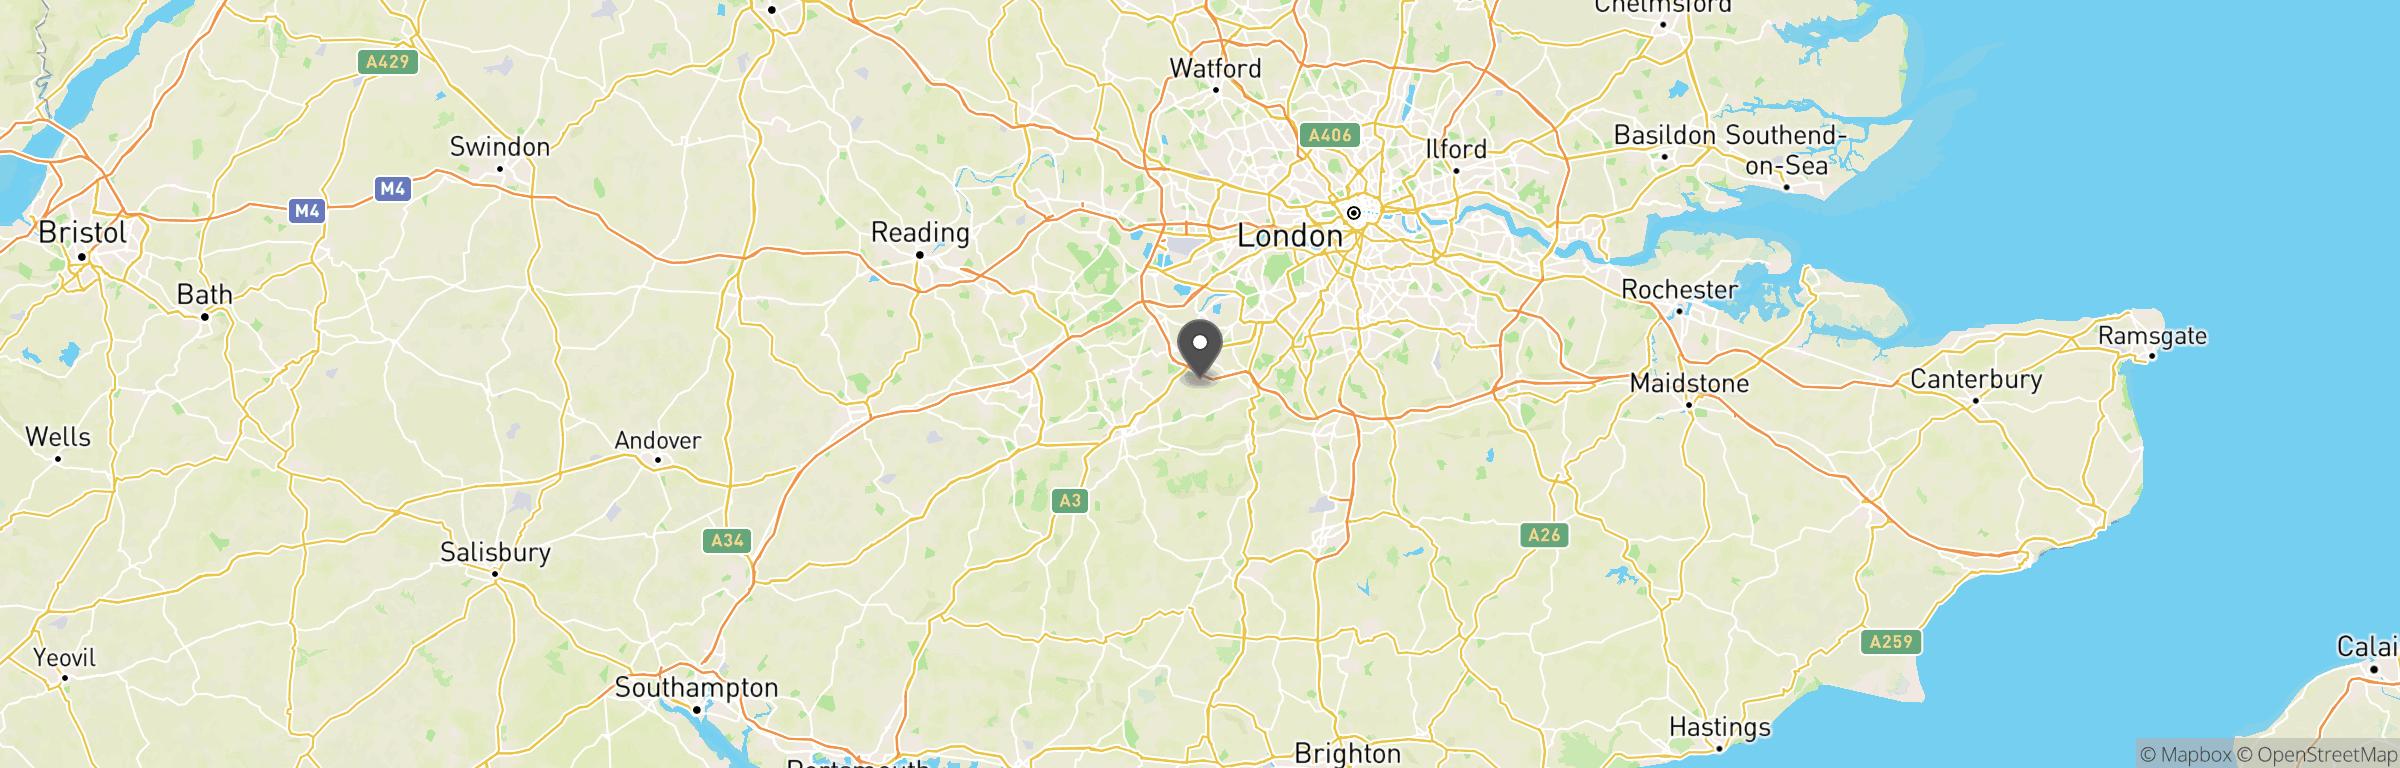 Location map of Ambush Airsoft